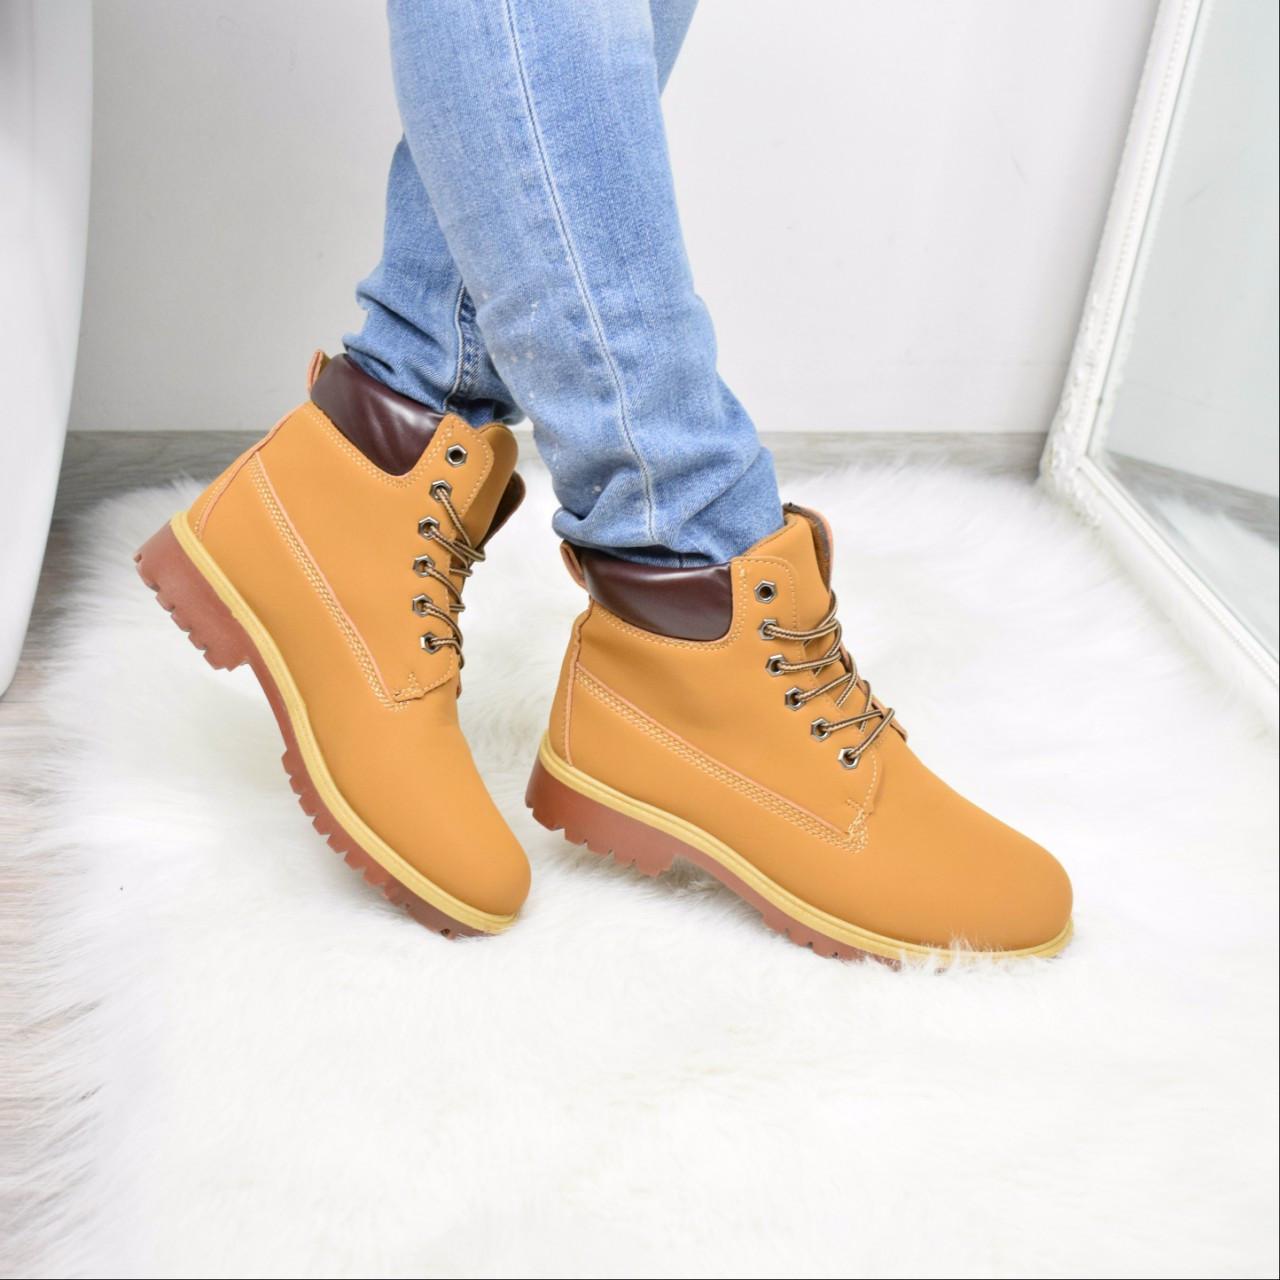 37d5643a35f2 Ботинки женские Timber коричневые 3671, ботинки женские - Интернет-магазин